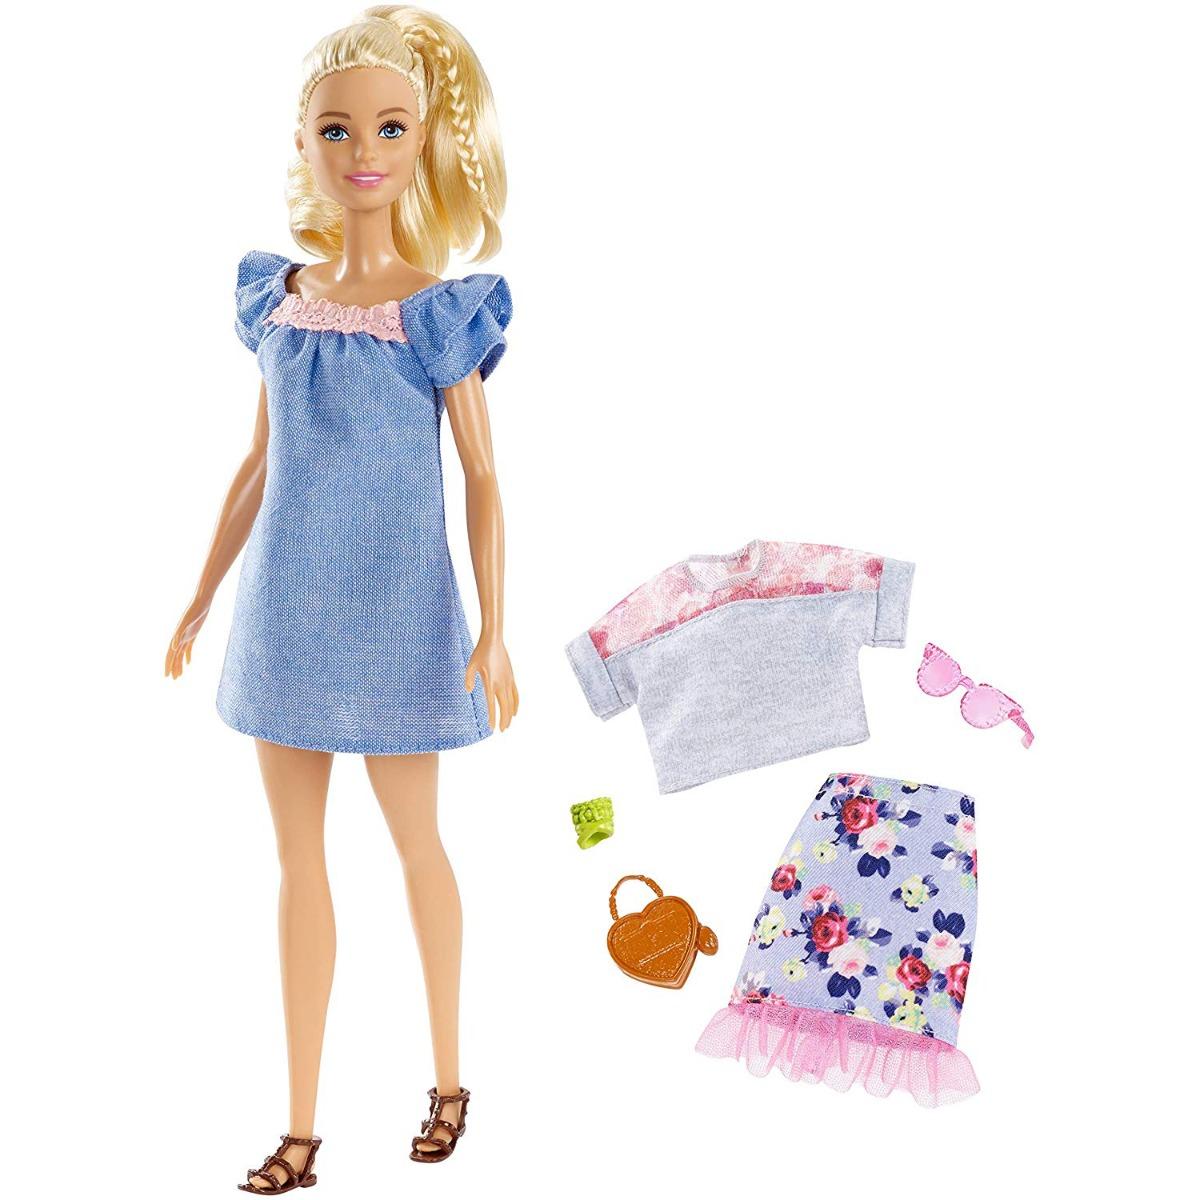 Papusa Barbie Fashionistas 99, Sweet Bloom, FRY79